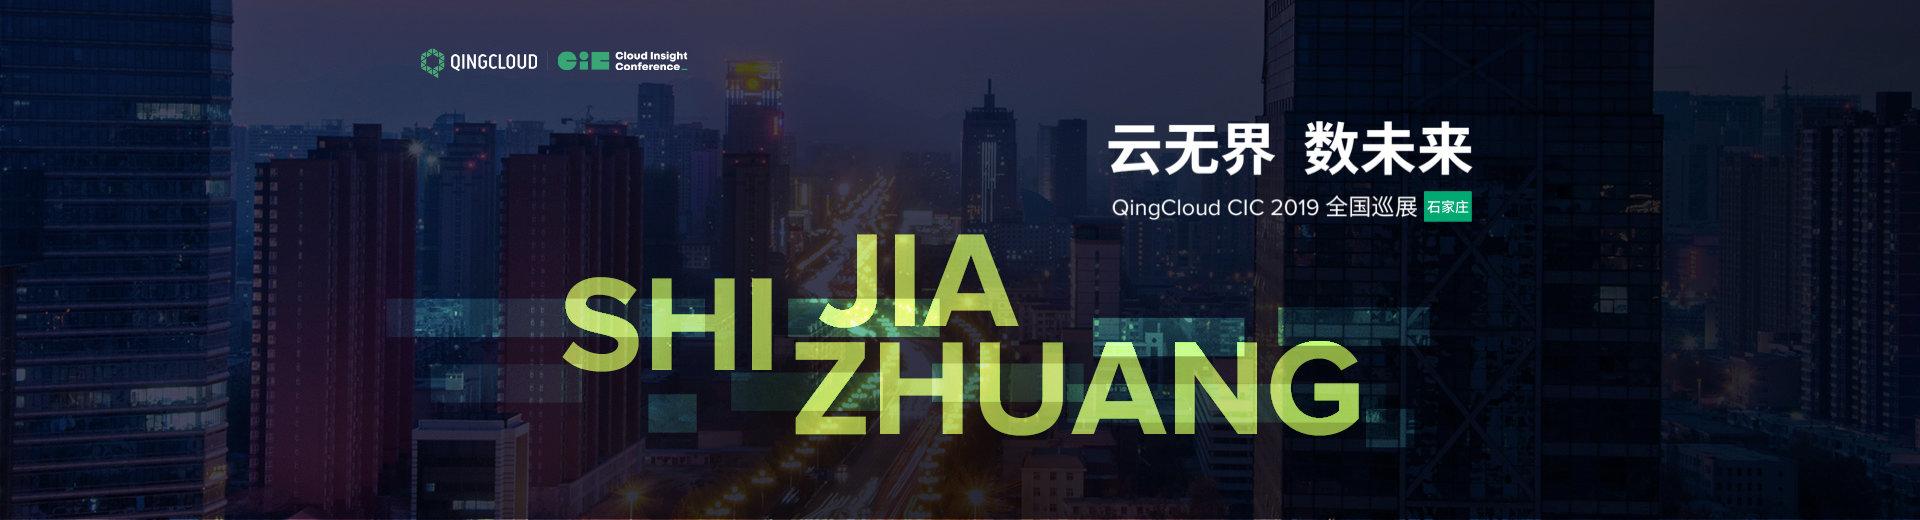 石家庄站 — CIC 2019 青云QingCloud 全国巡展